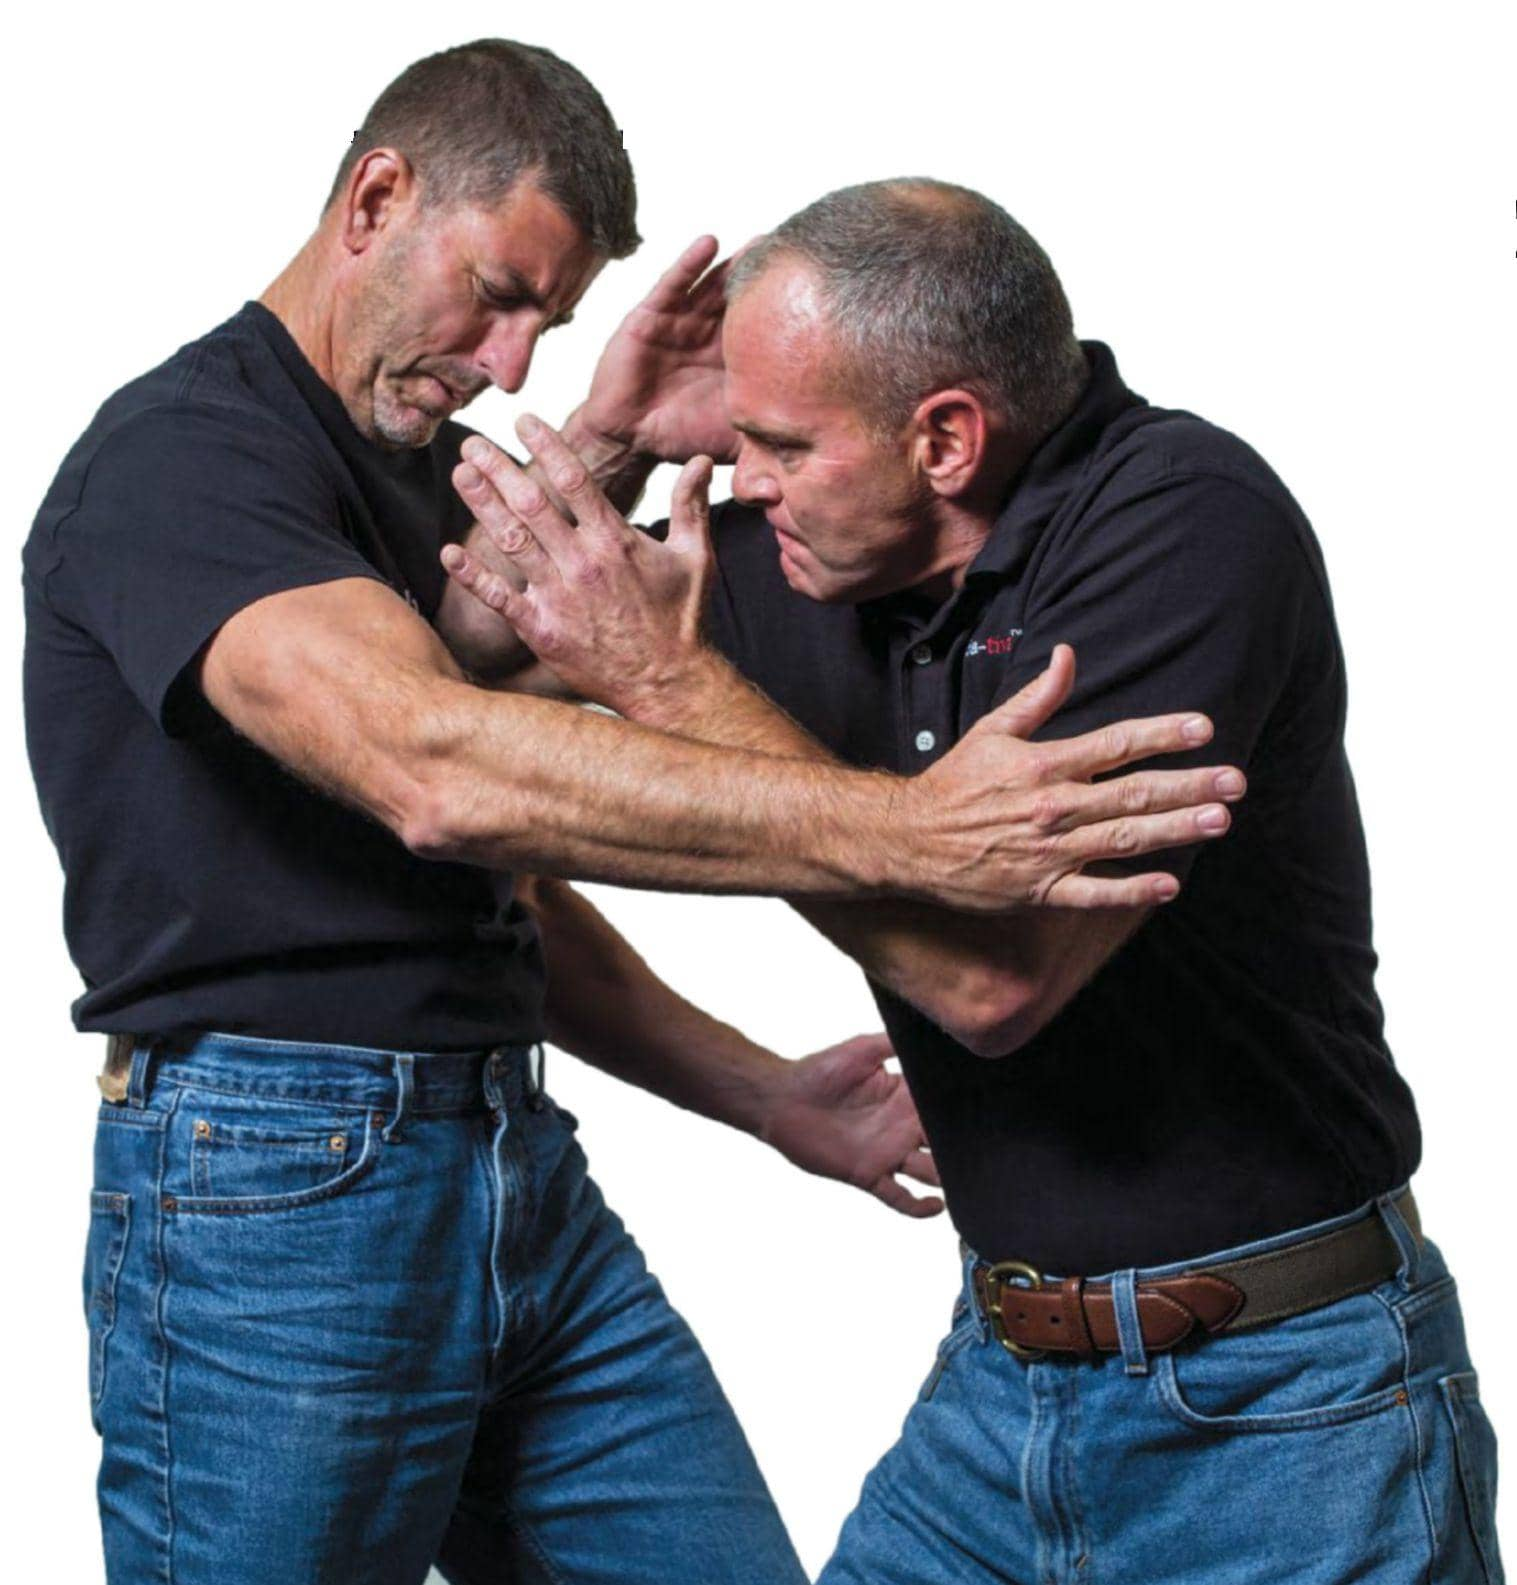 Sudden Violence